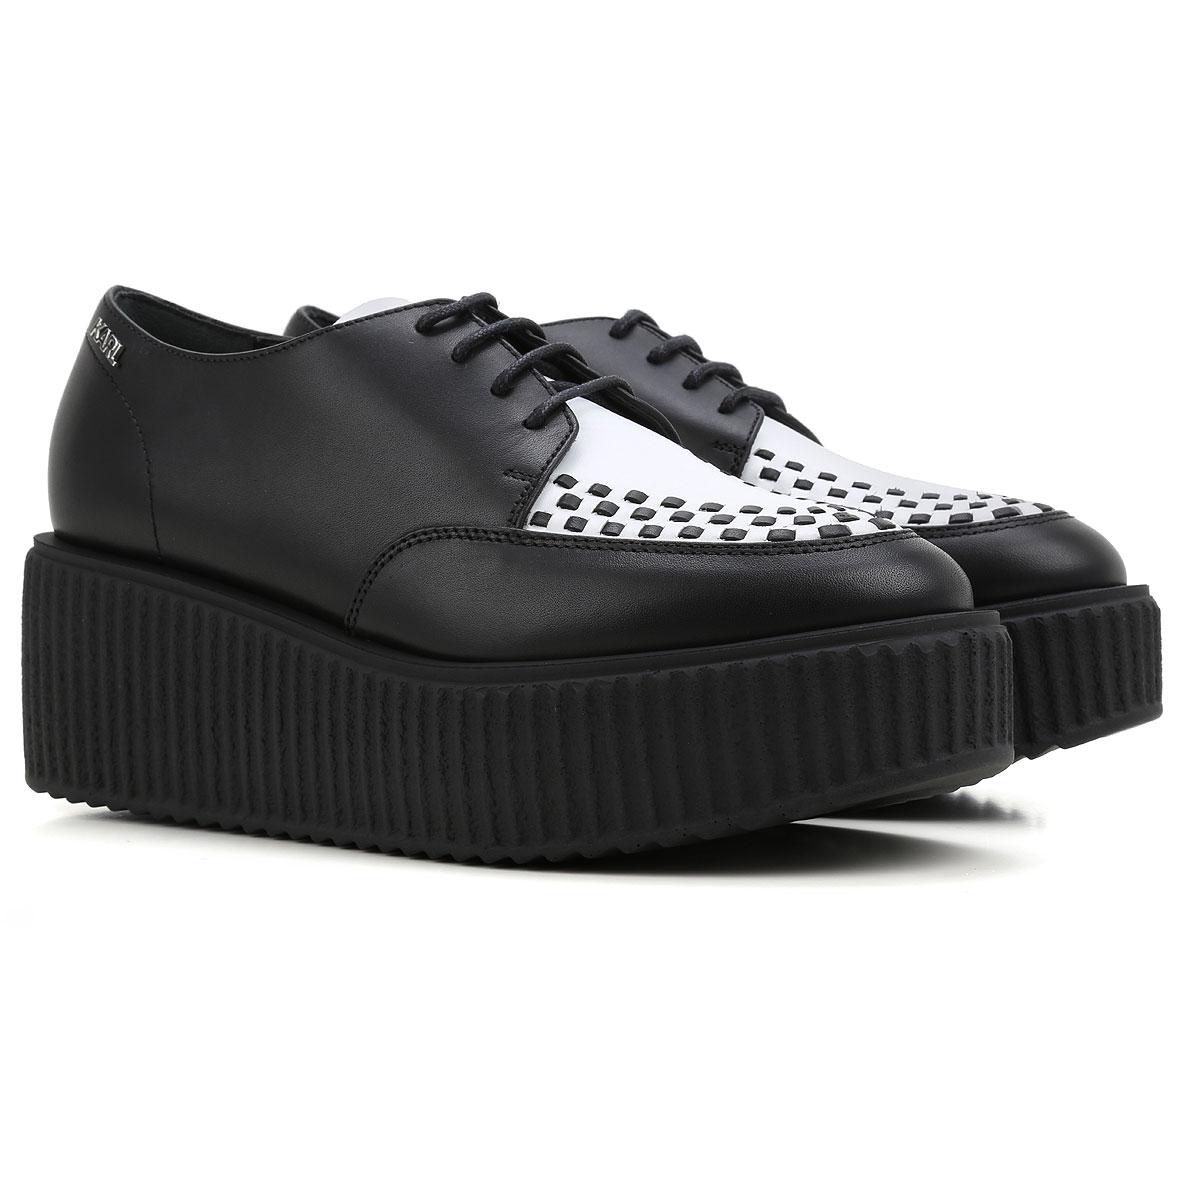 chaussures femme karl lagerfeld code produit 66kw4023 bianer. Black Bedroom Furniture Sets. Home Design Ideas